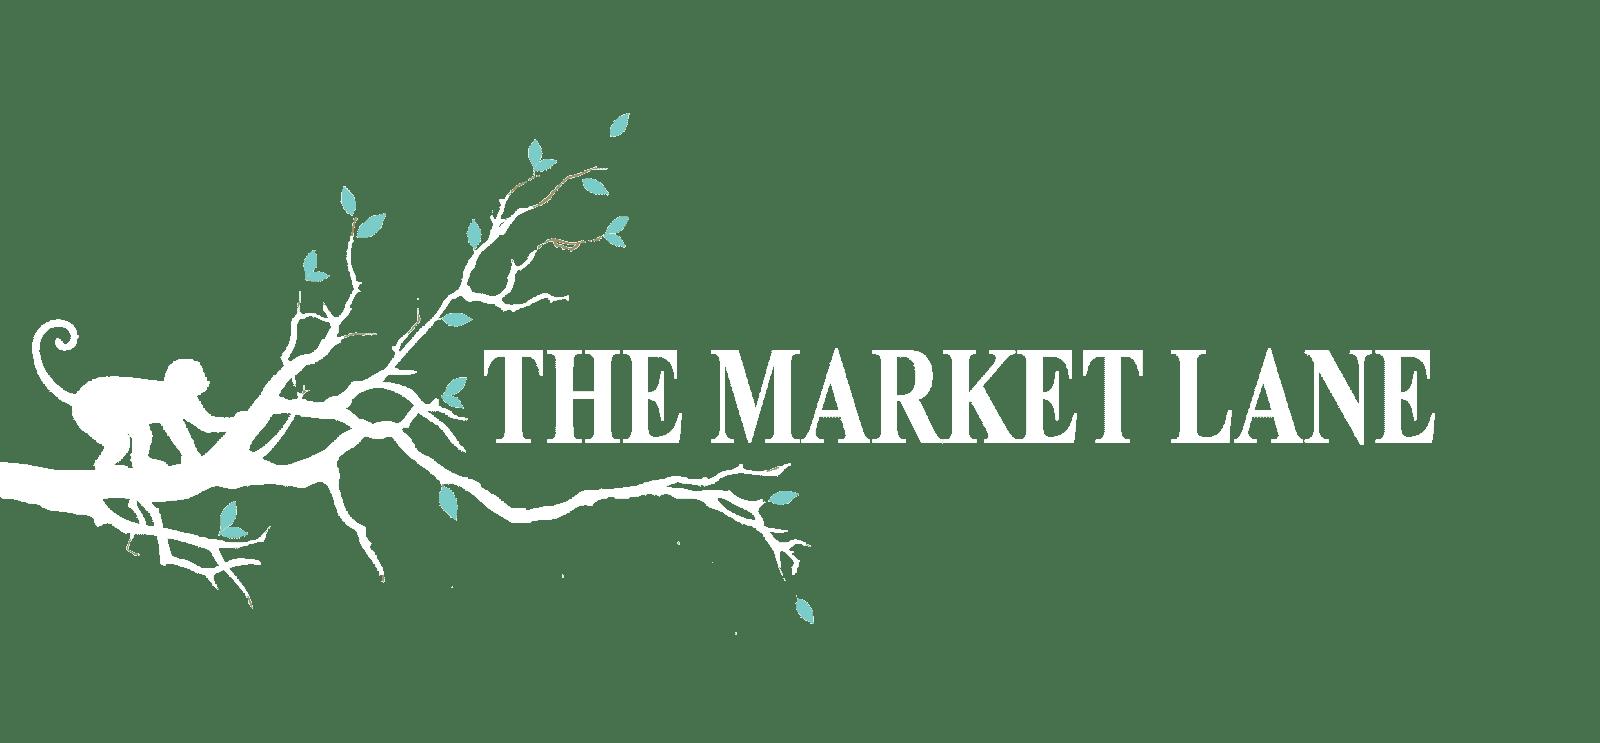 The Market Lane